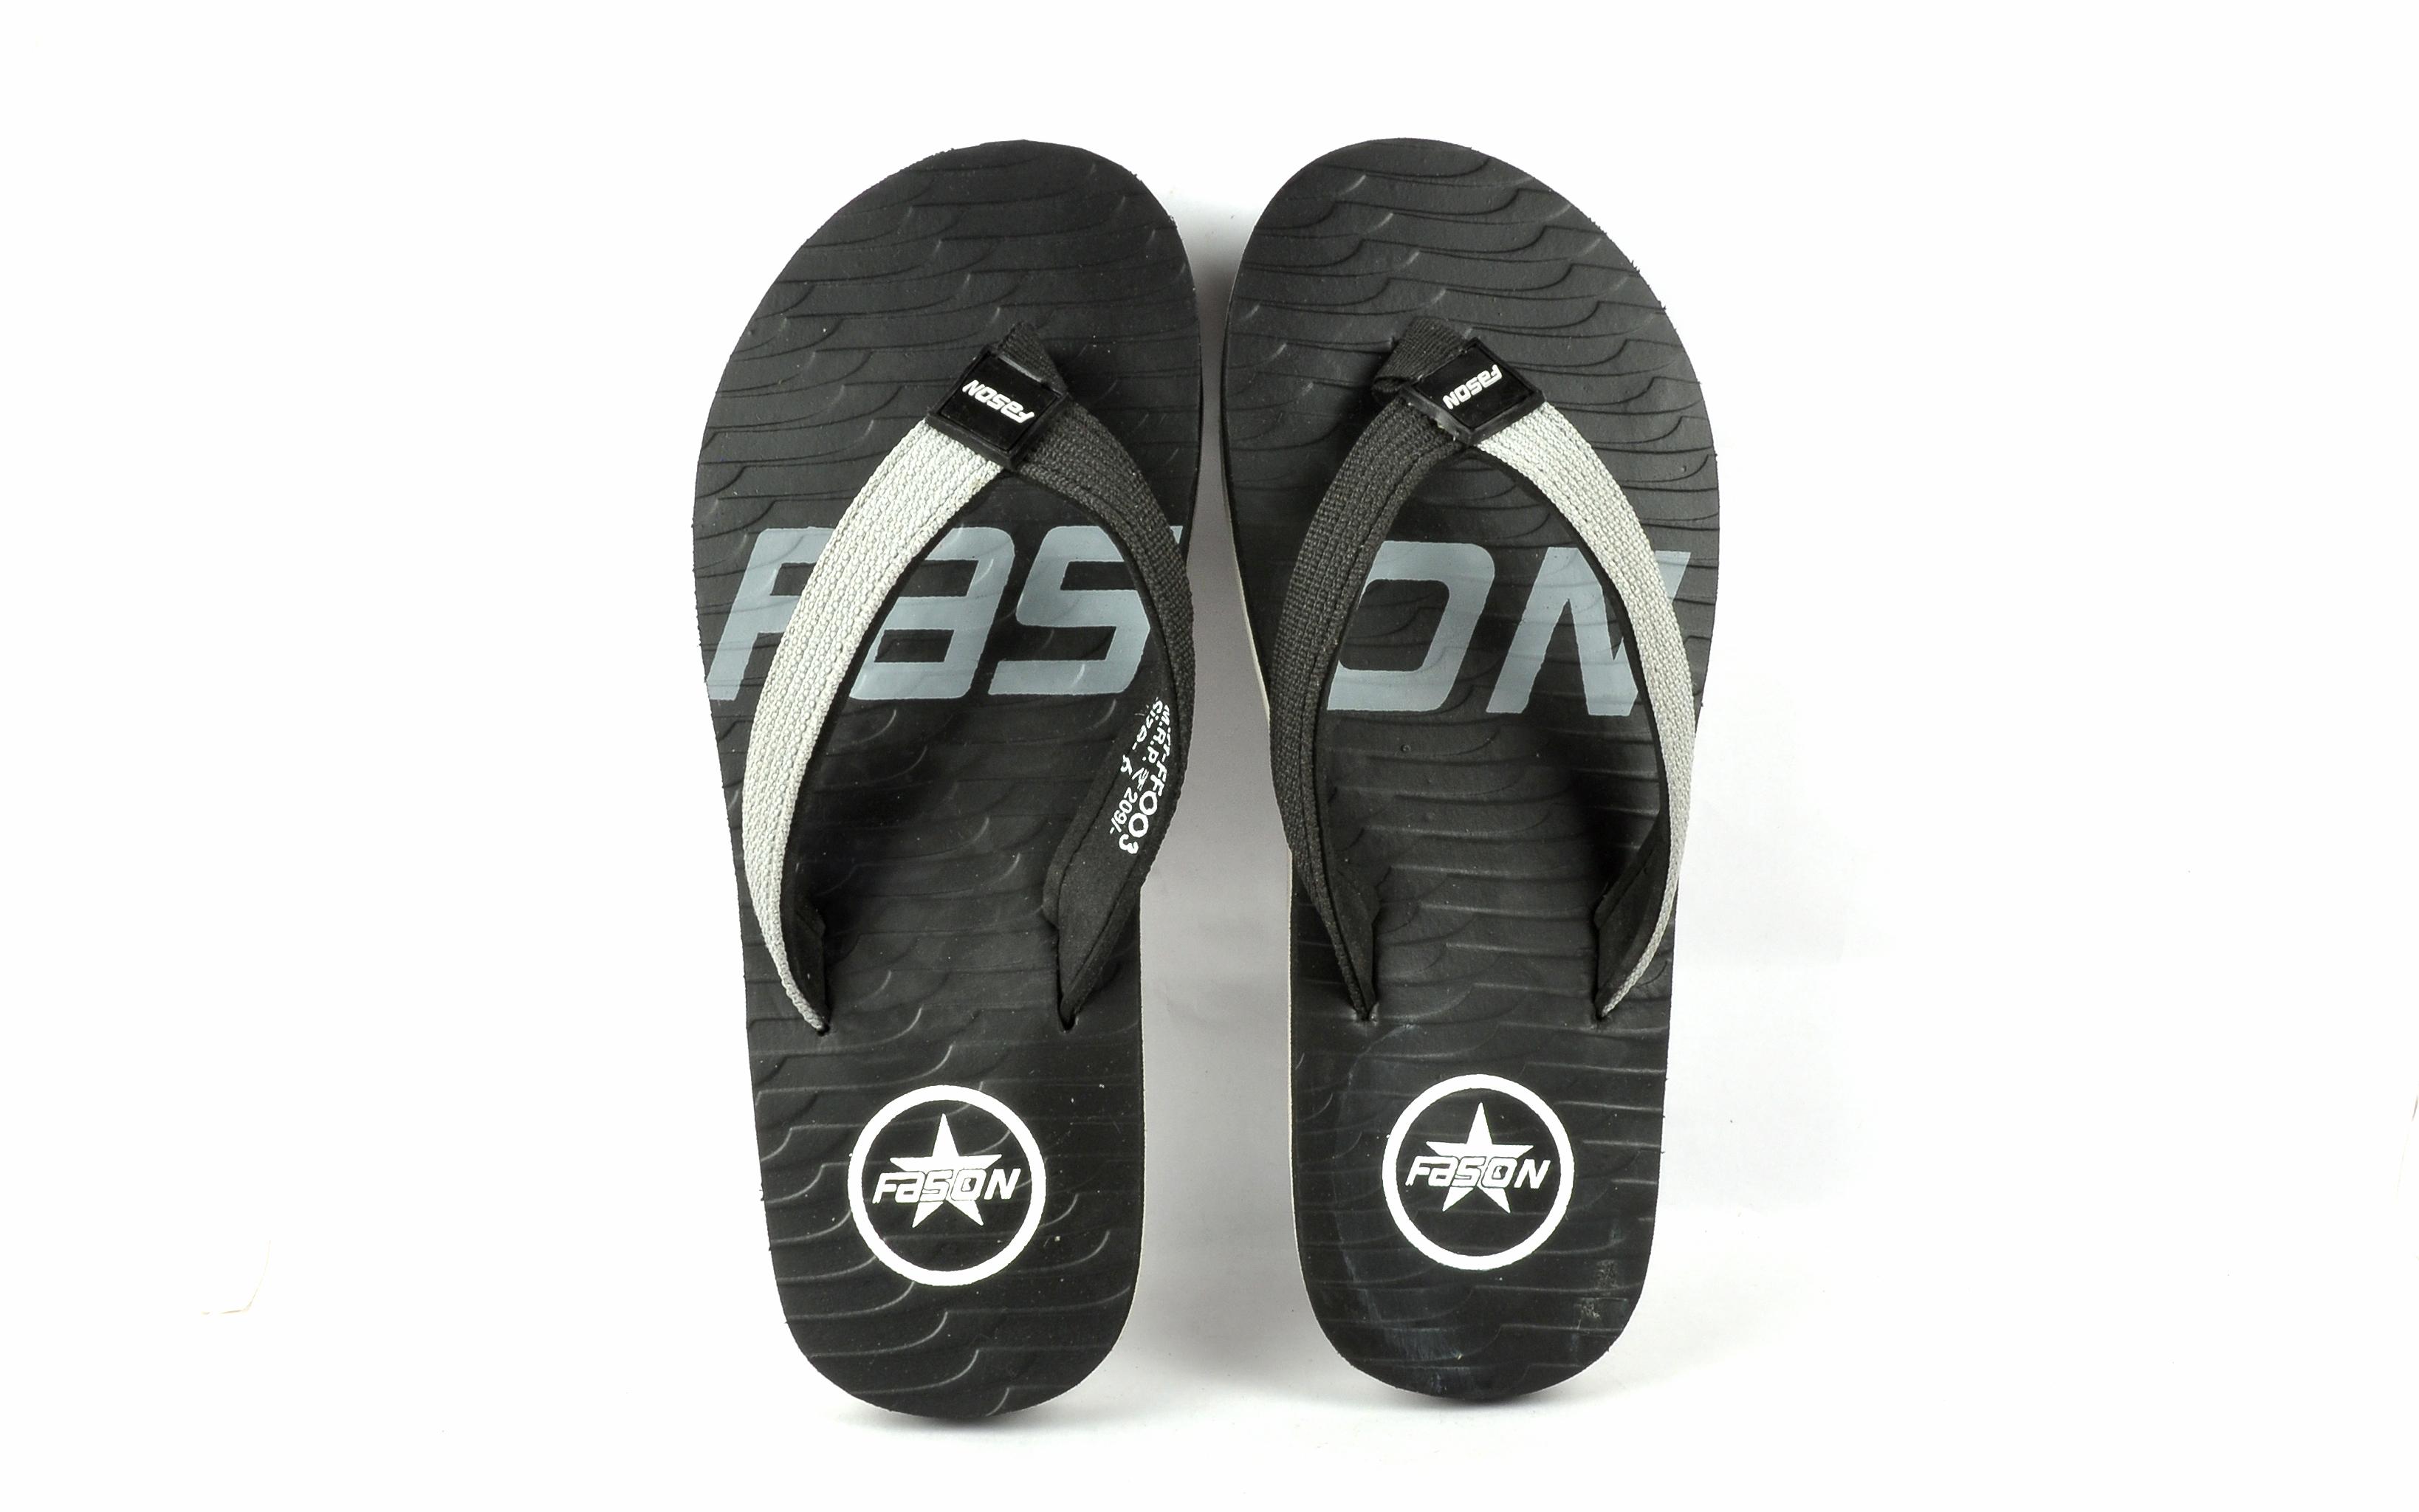 Men flip flop slipper